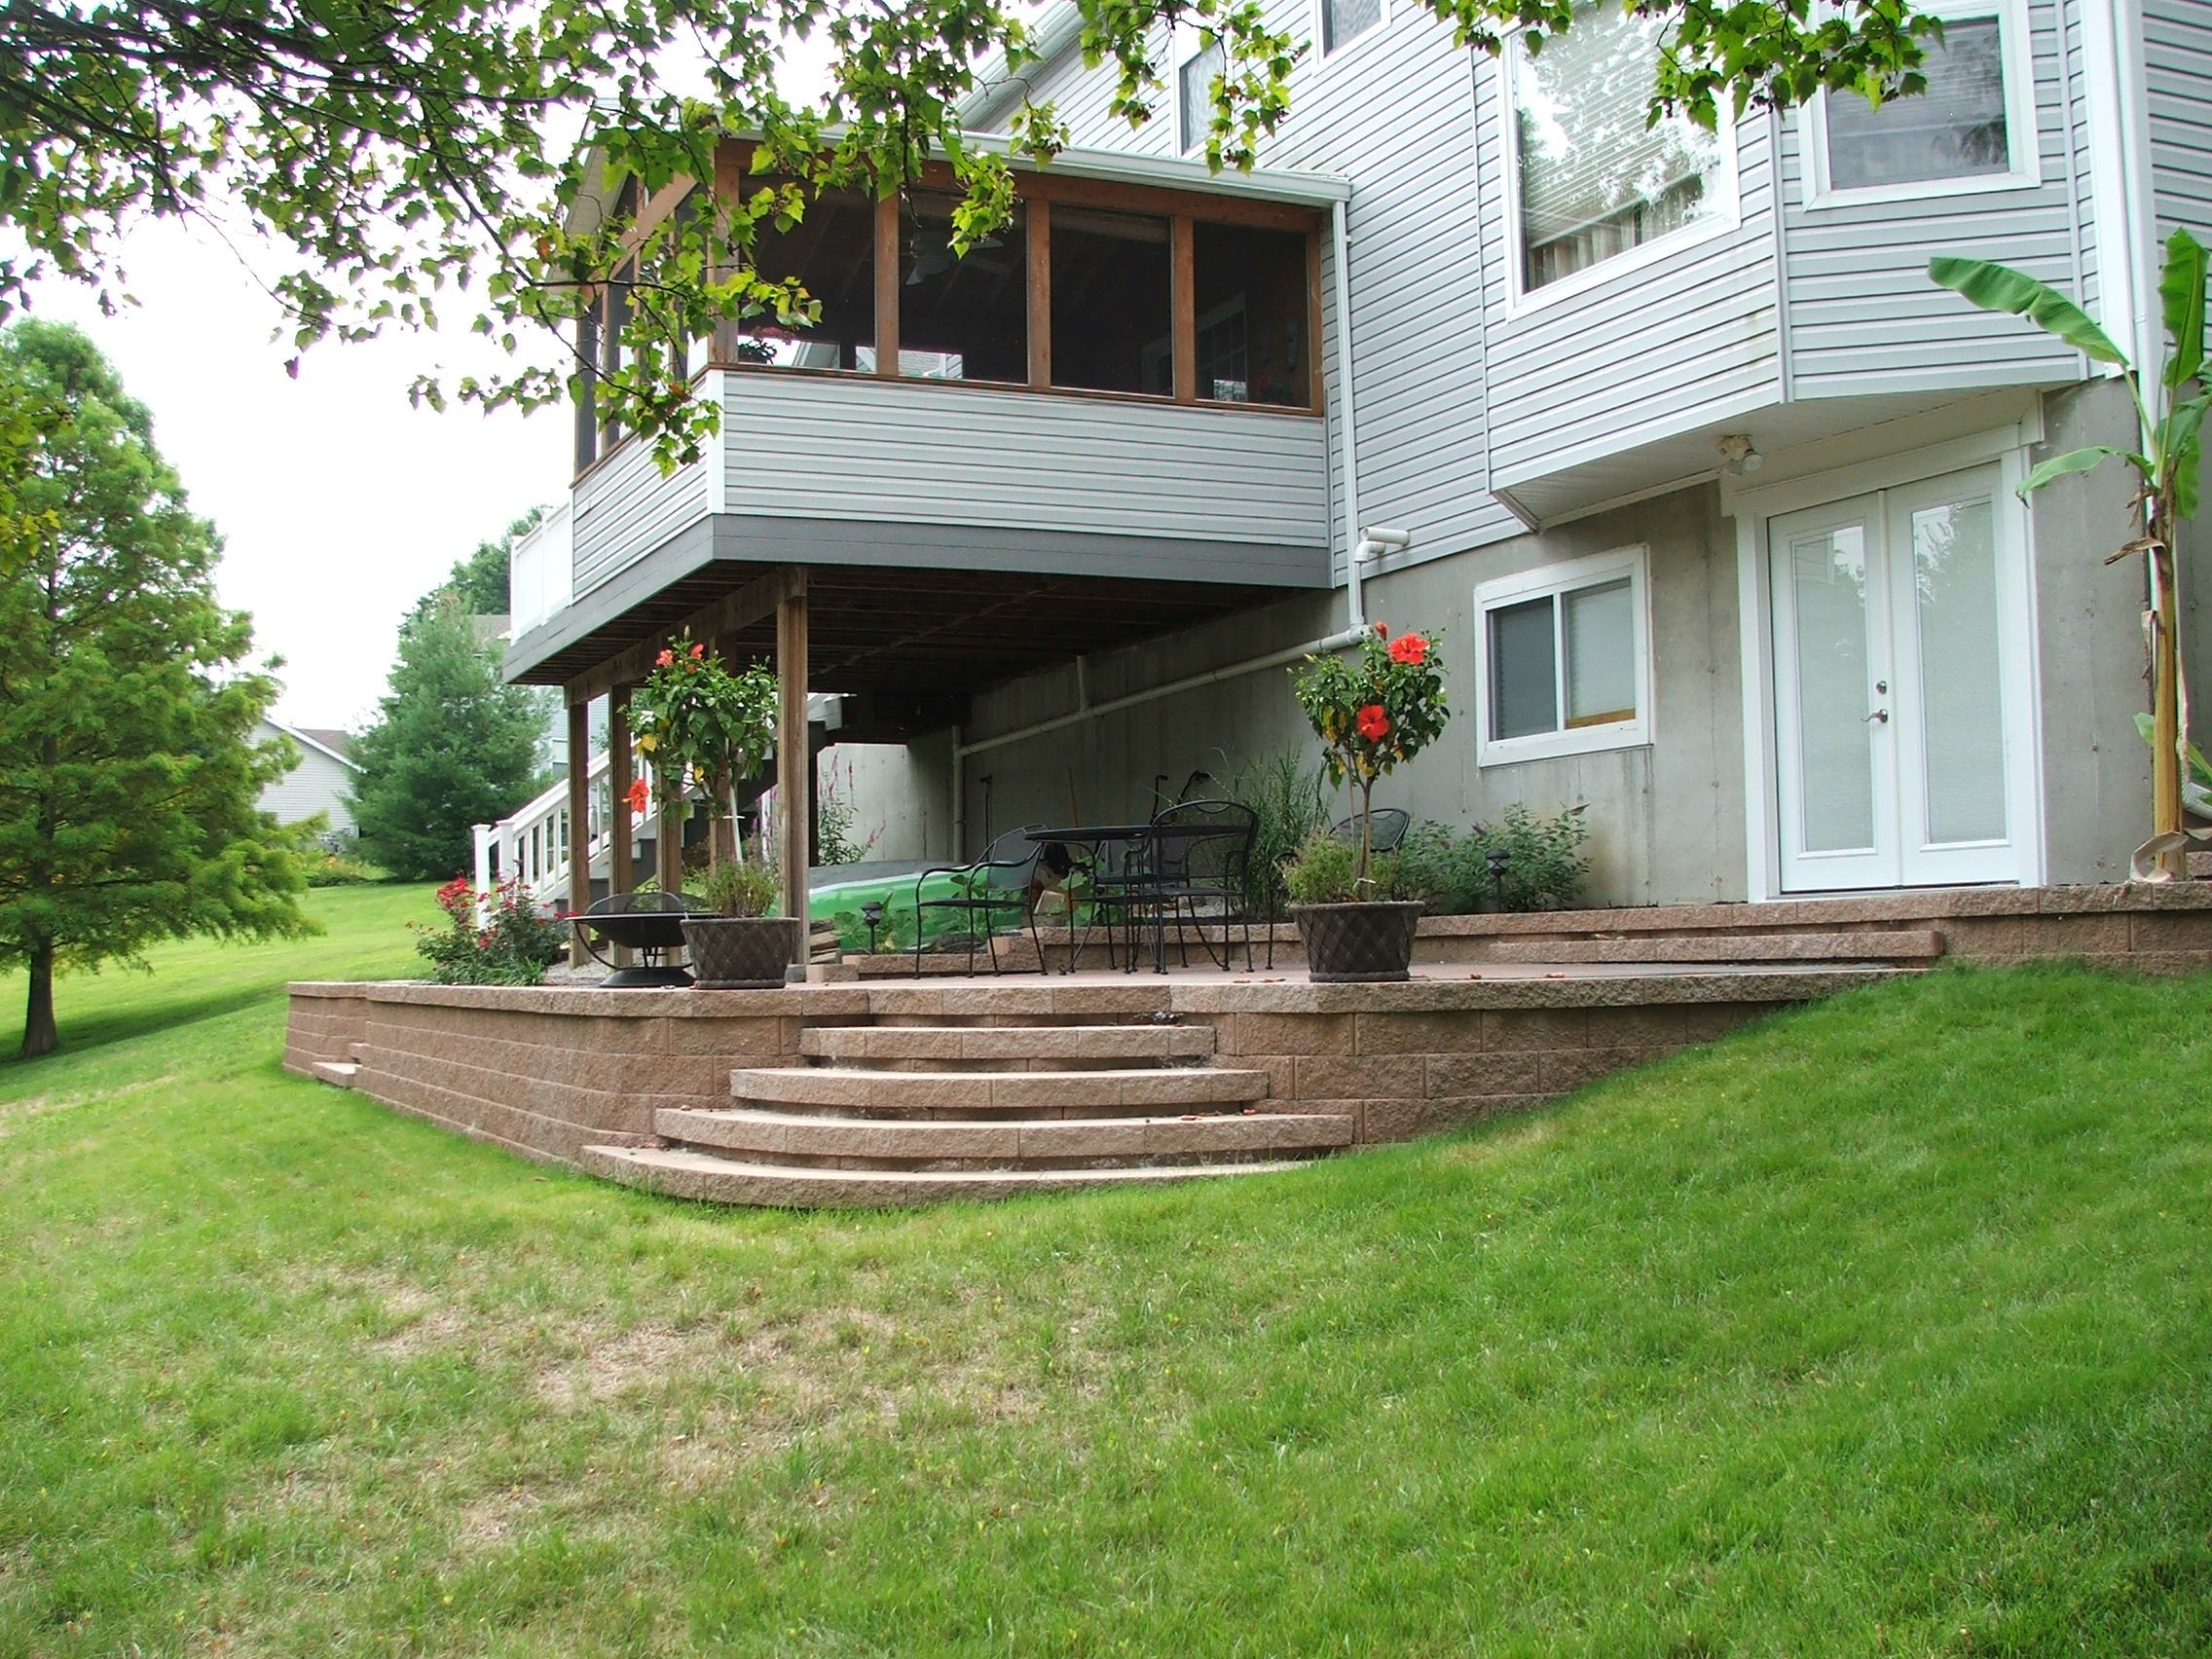 patio on a hill - Google Search | Patio ideas 2014 ...